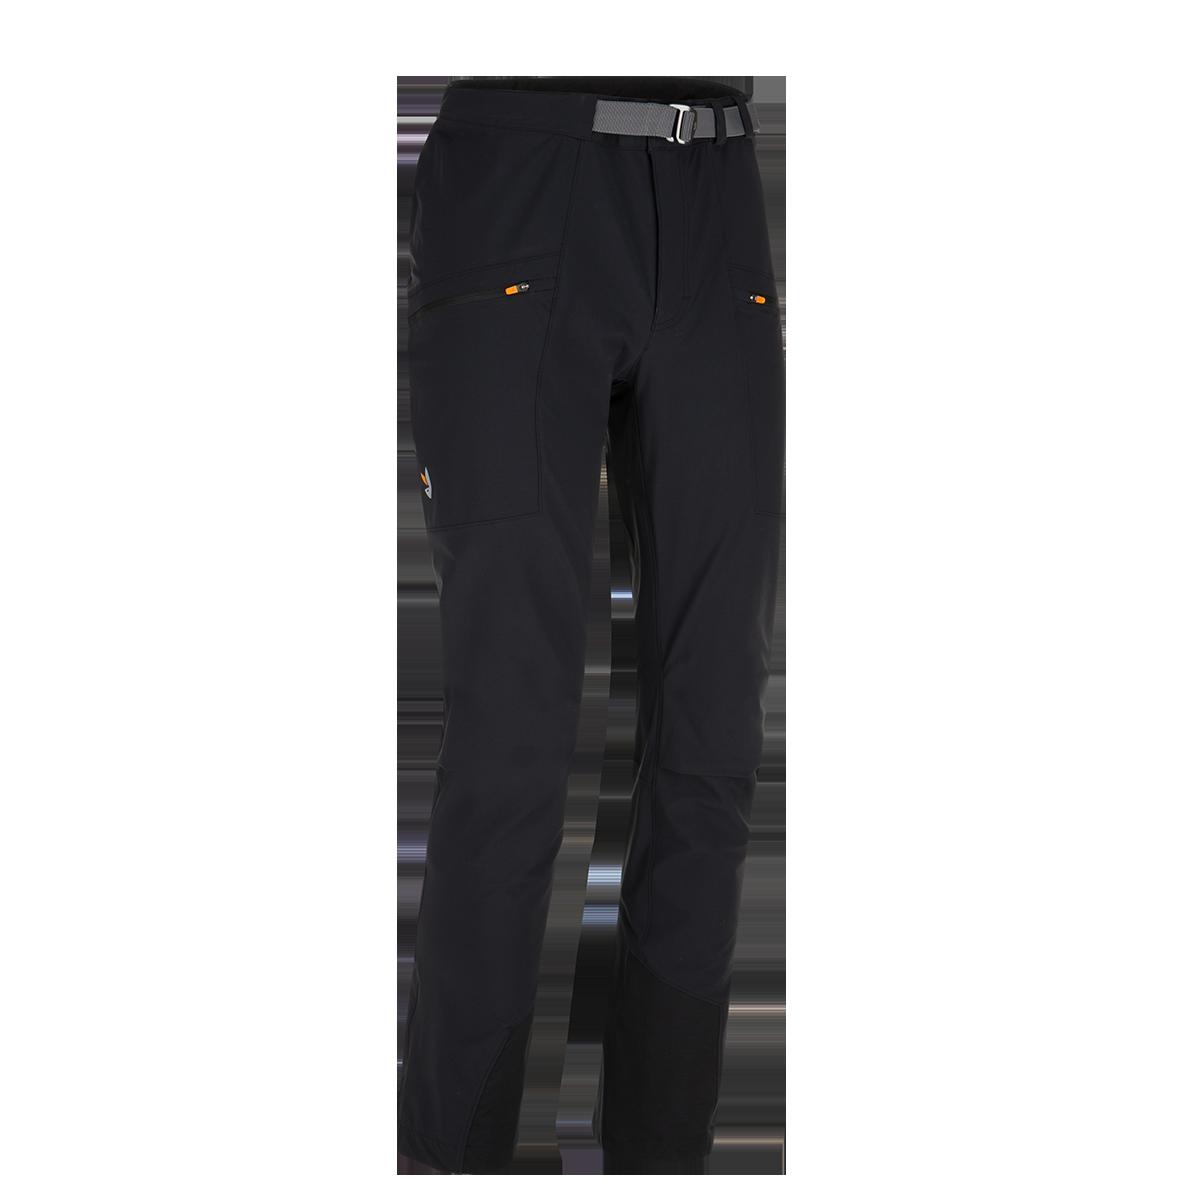 Zajo Air LT Neo Pants Black 1